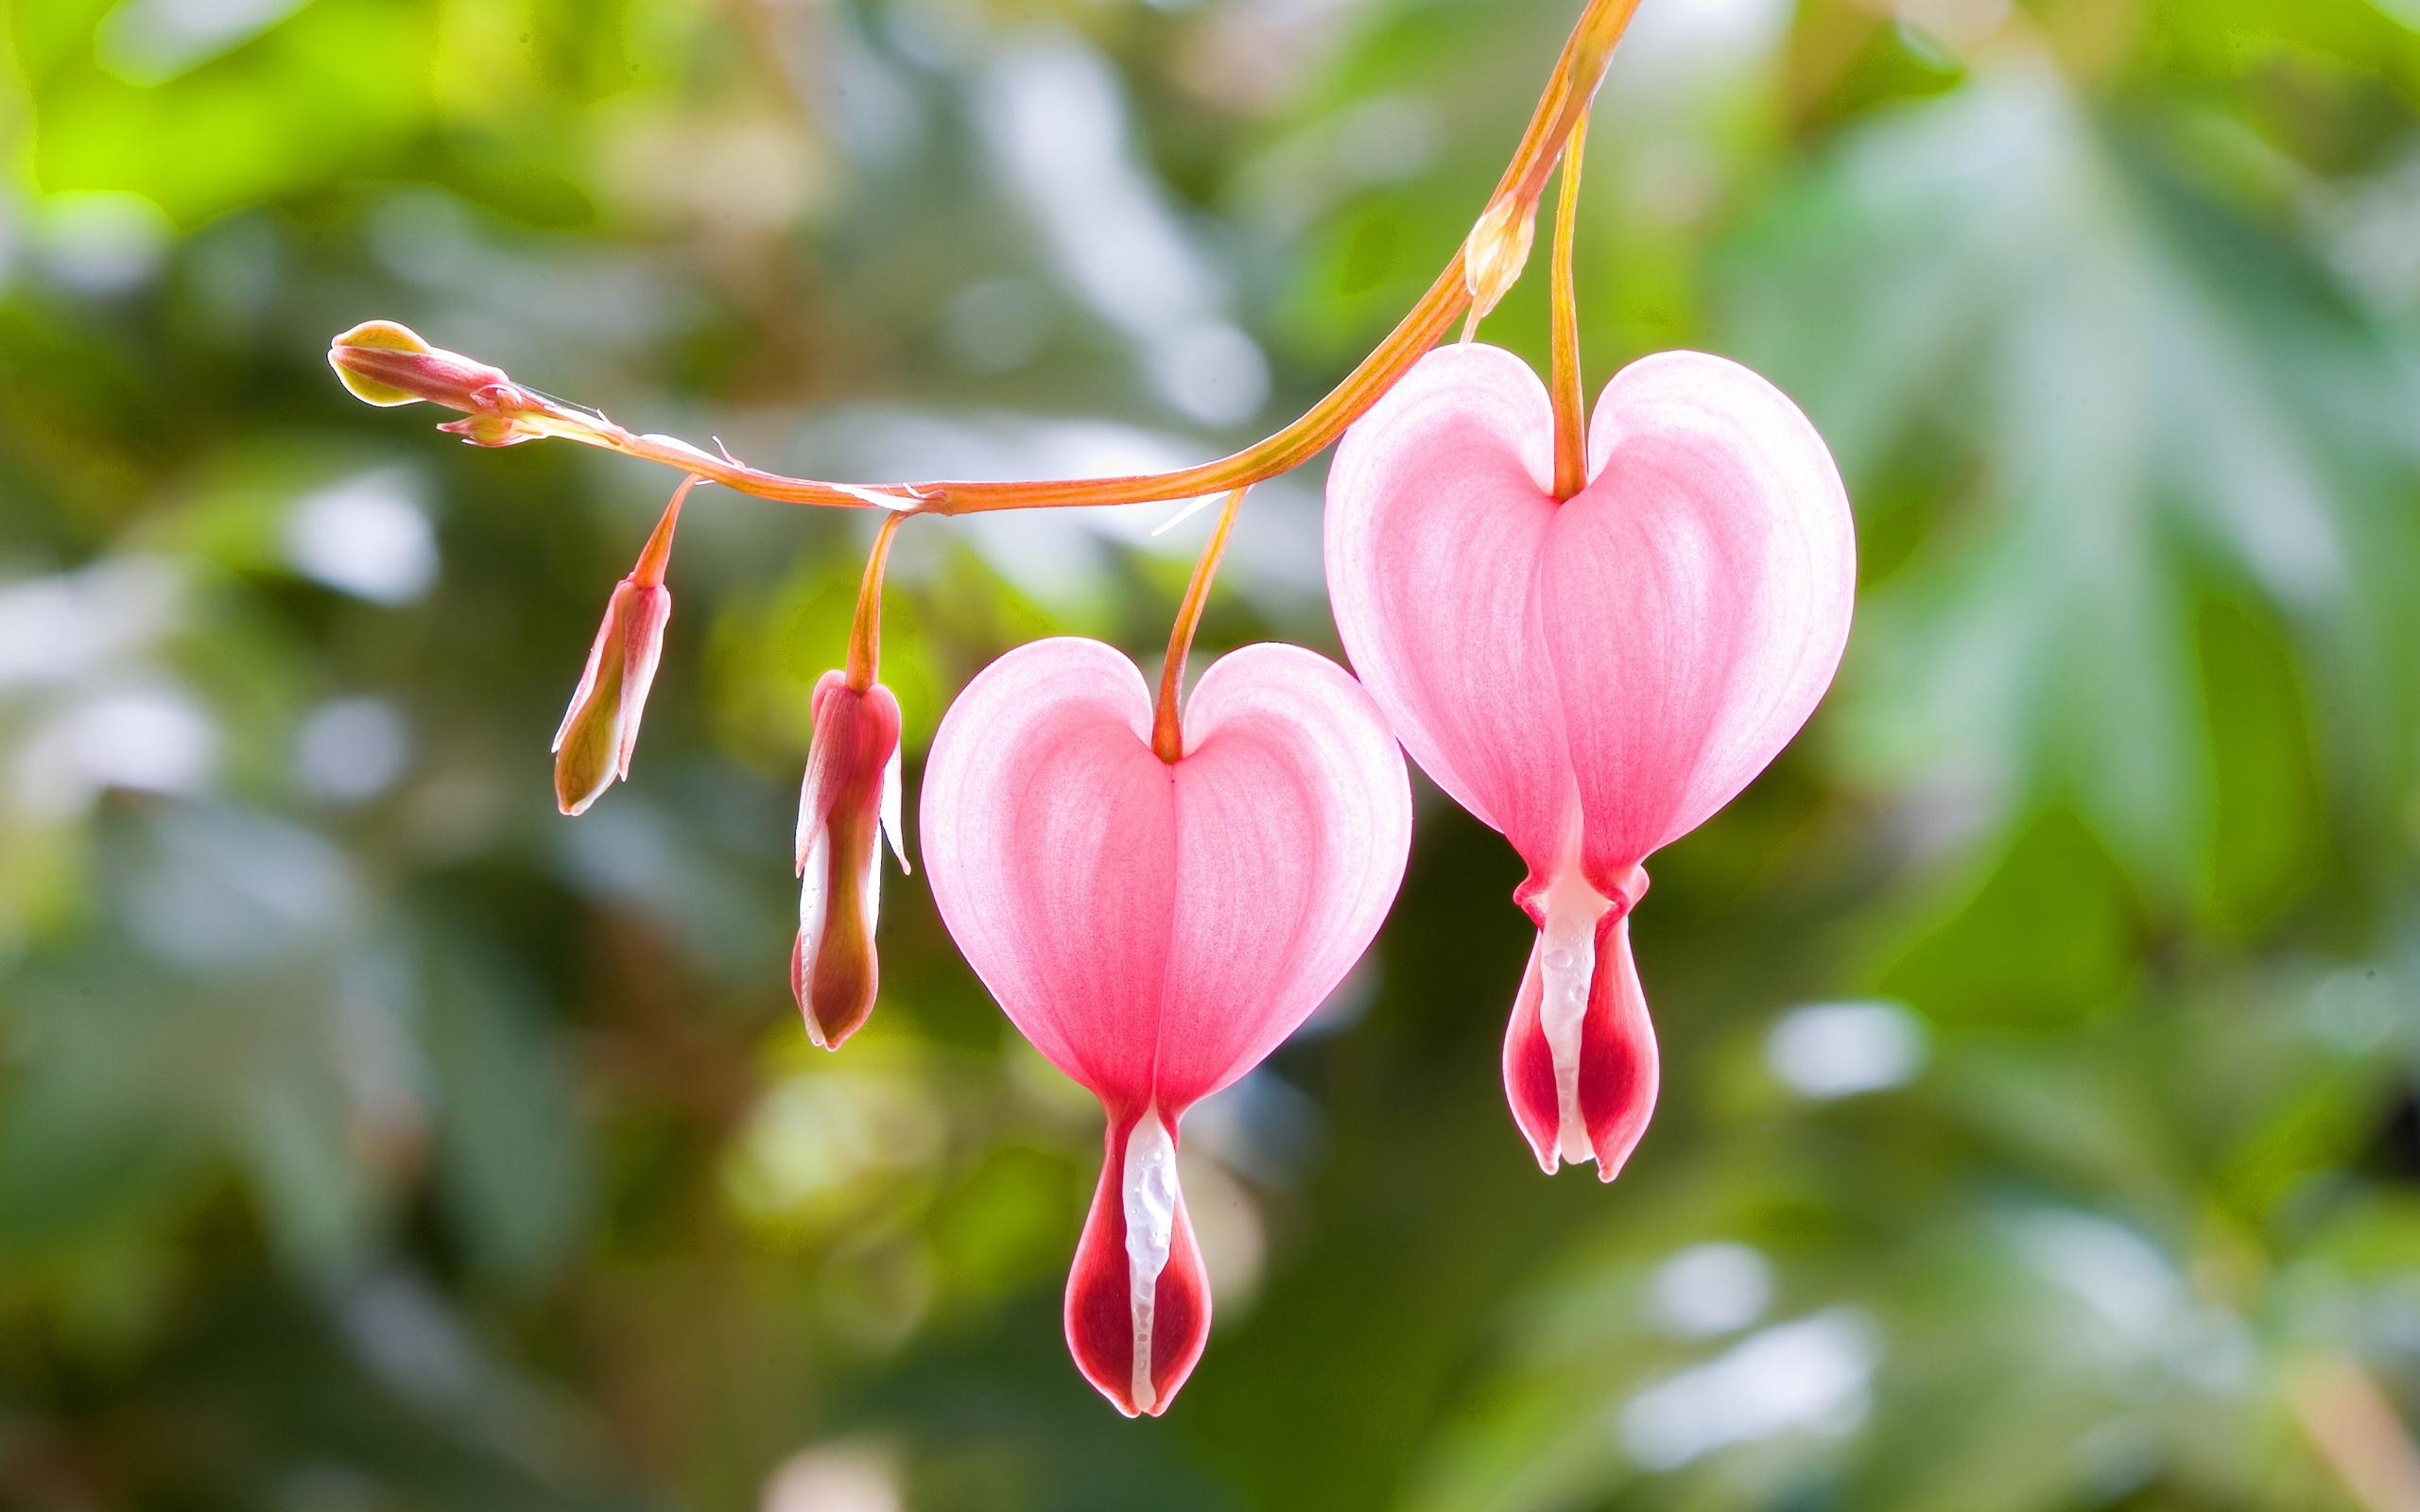 Pink heart flowers